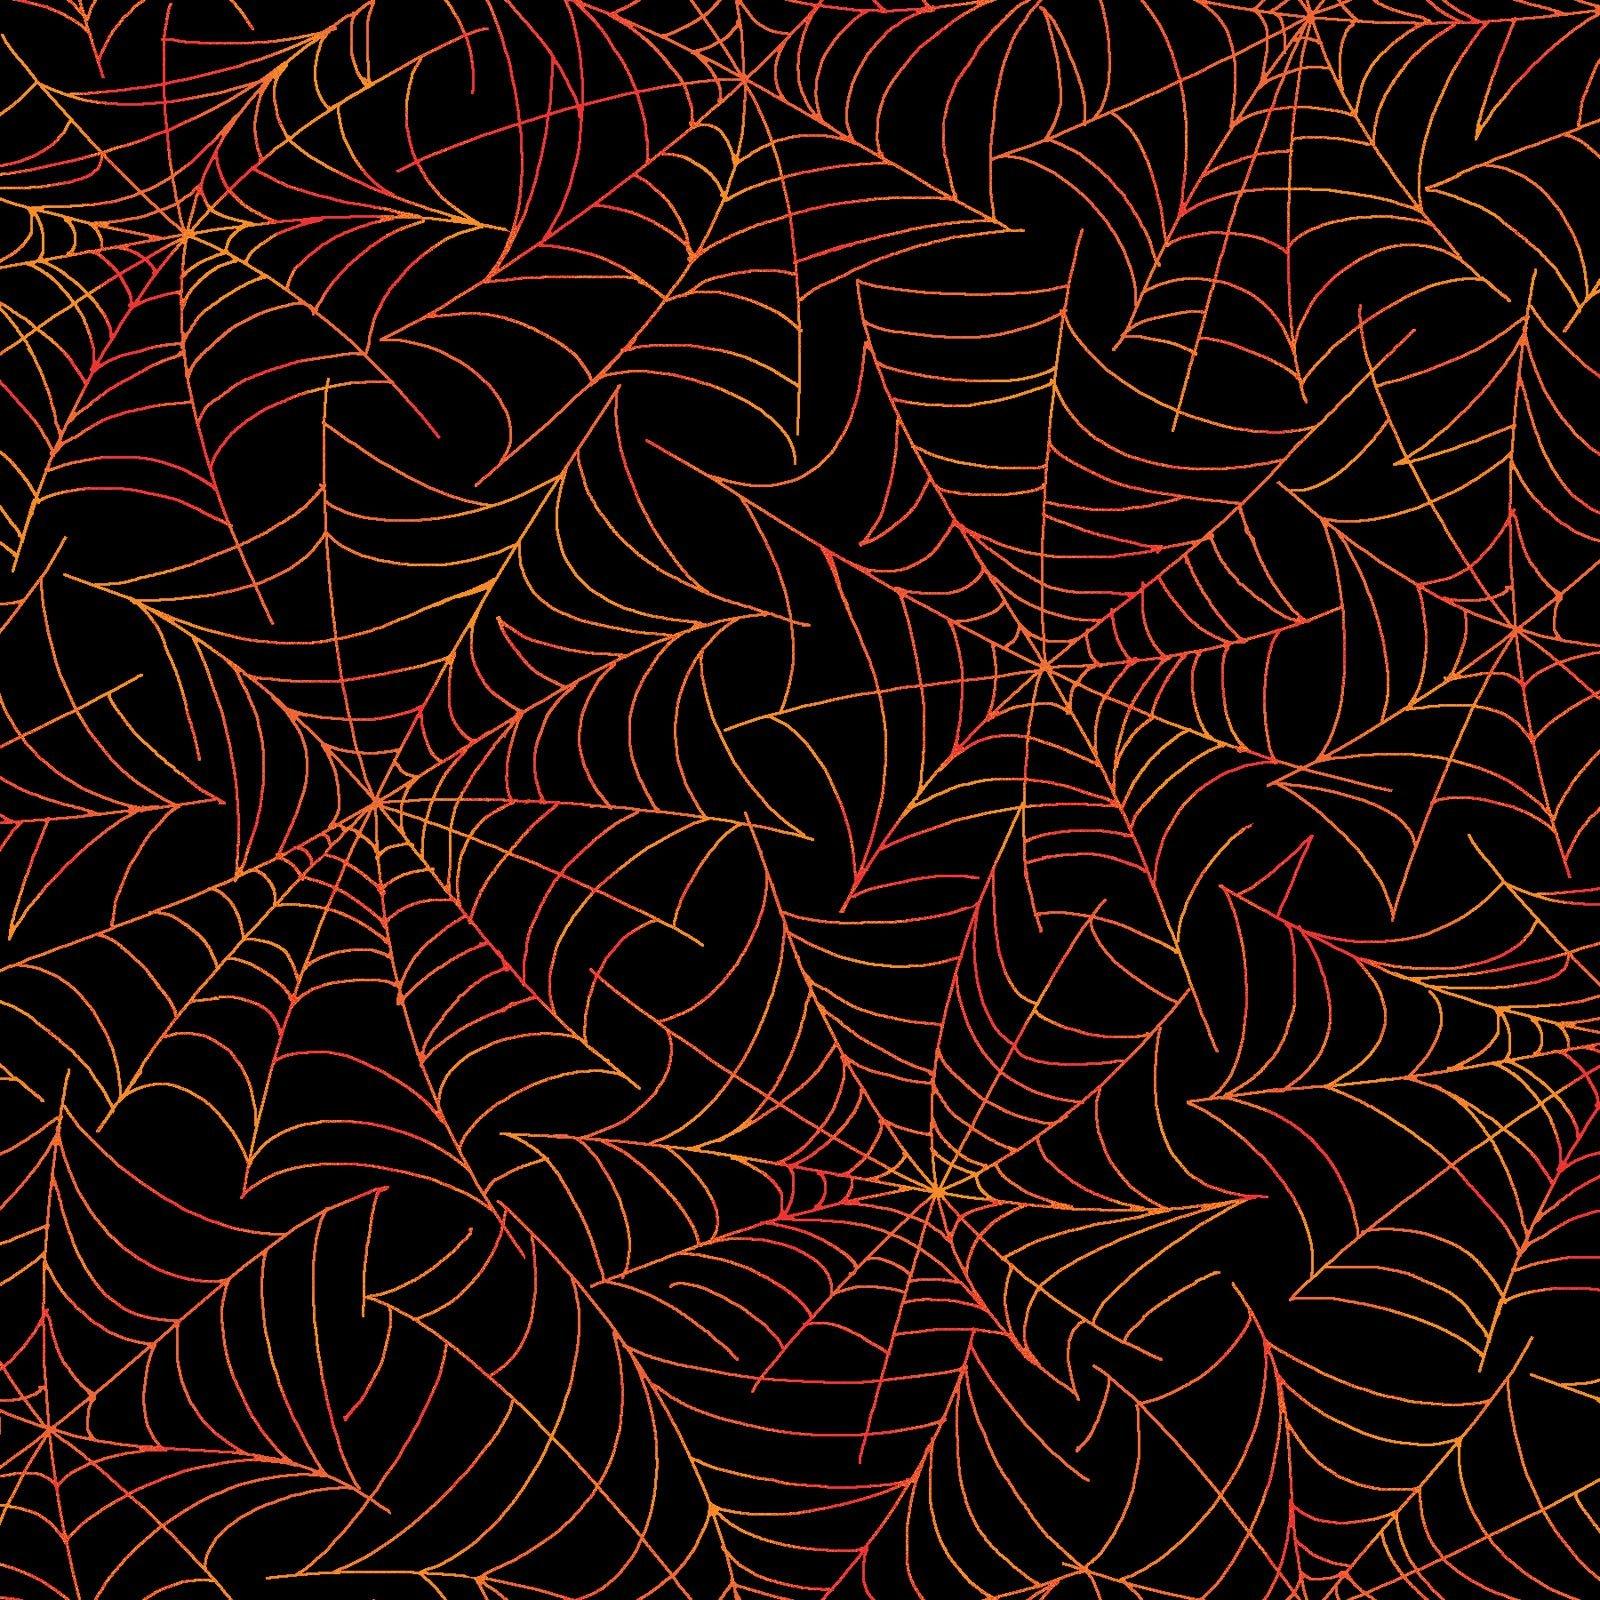 Broomhilda's Bakery - Spiderweb - Black/Orange